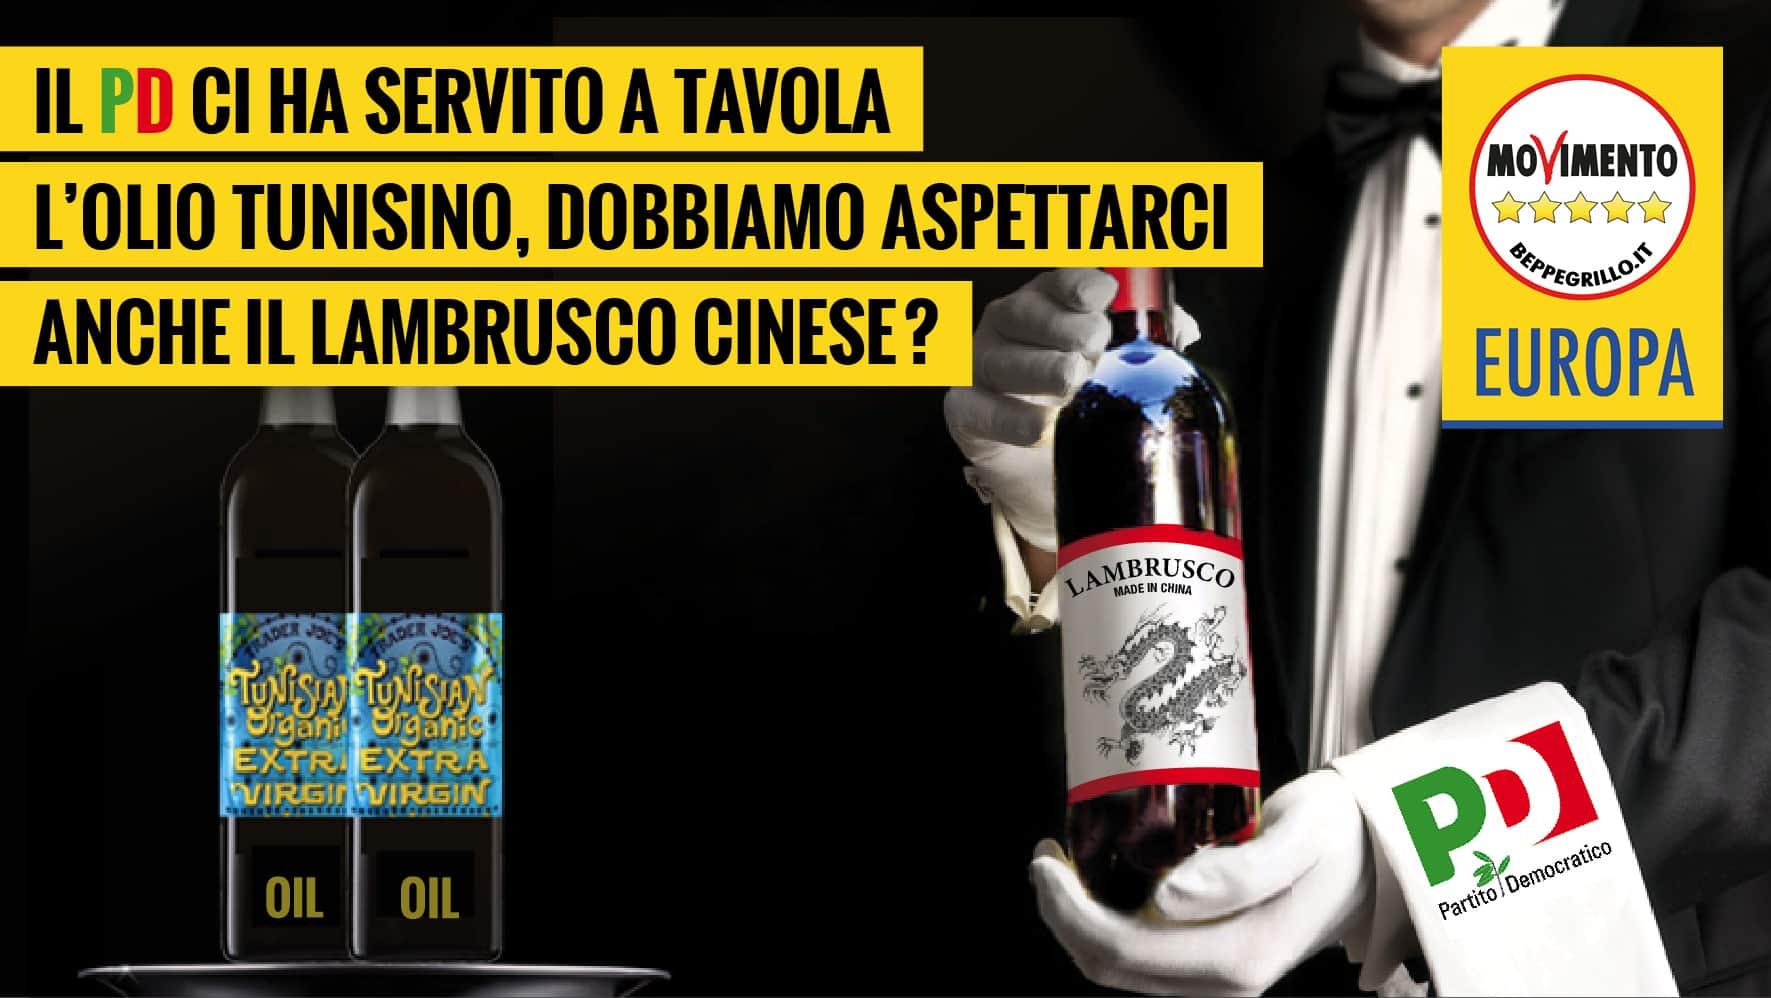 Marco Zullo M5S Europa lambrusco olio tunisino